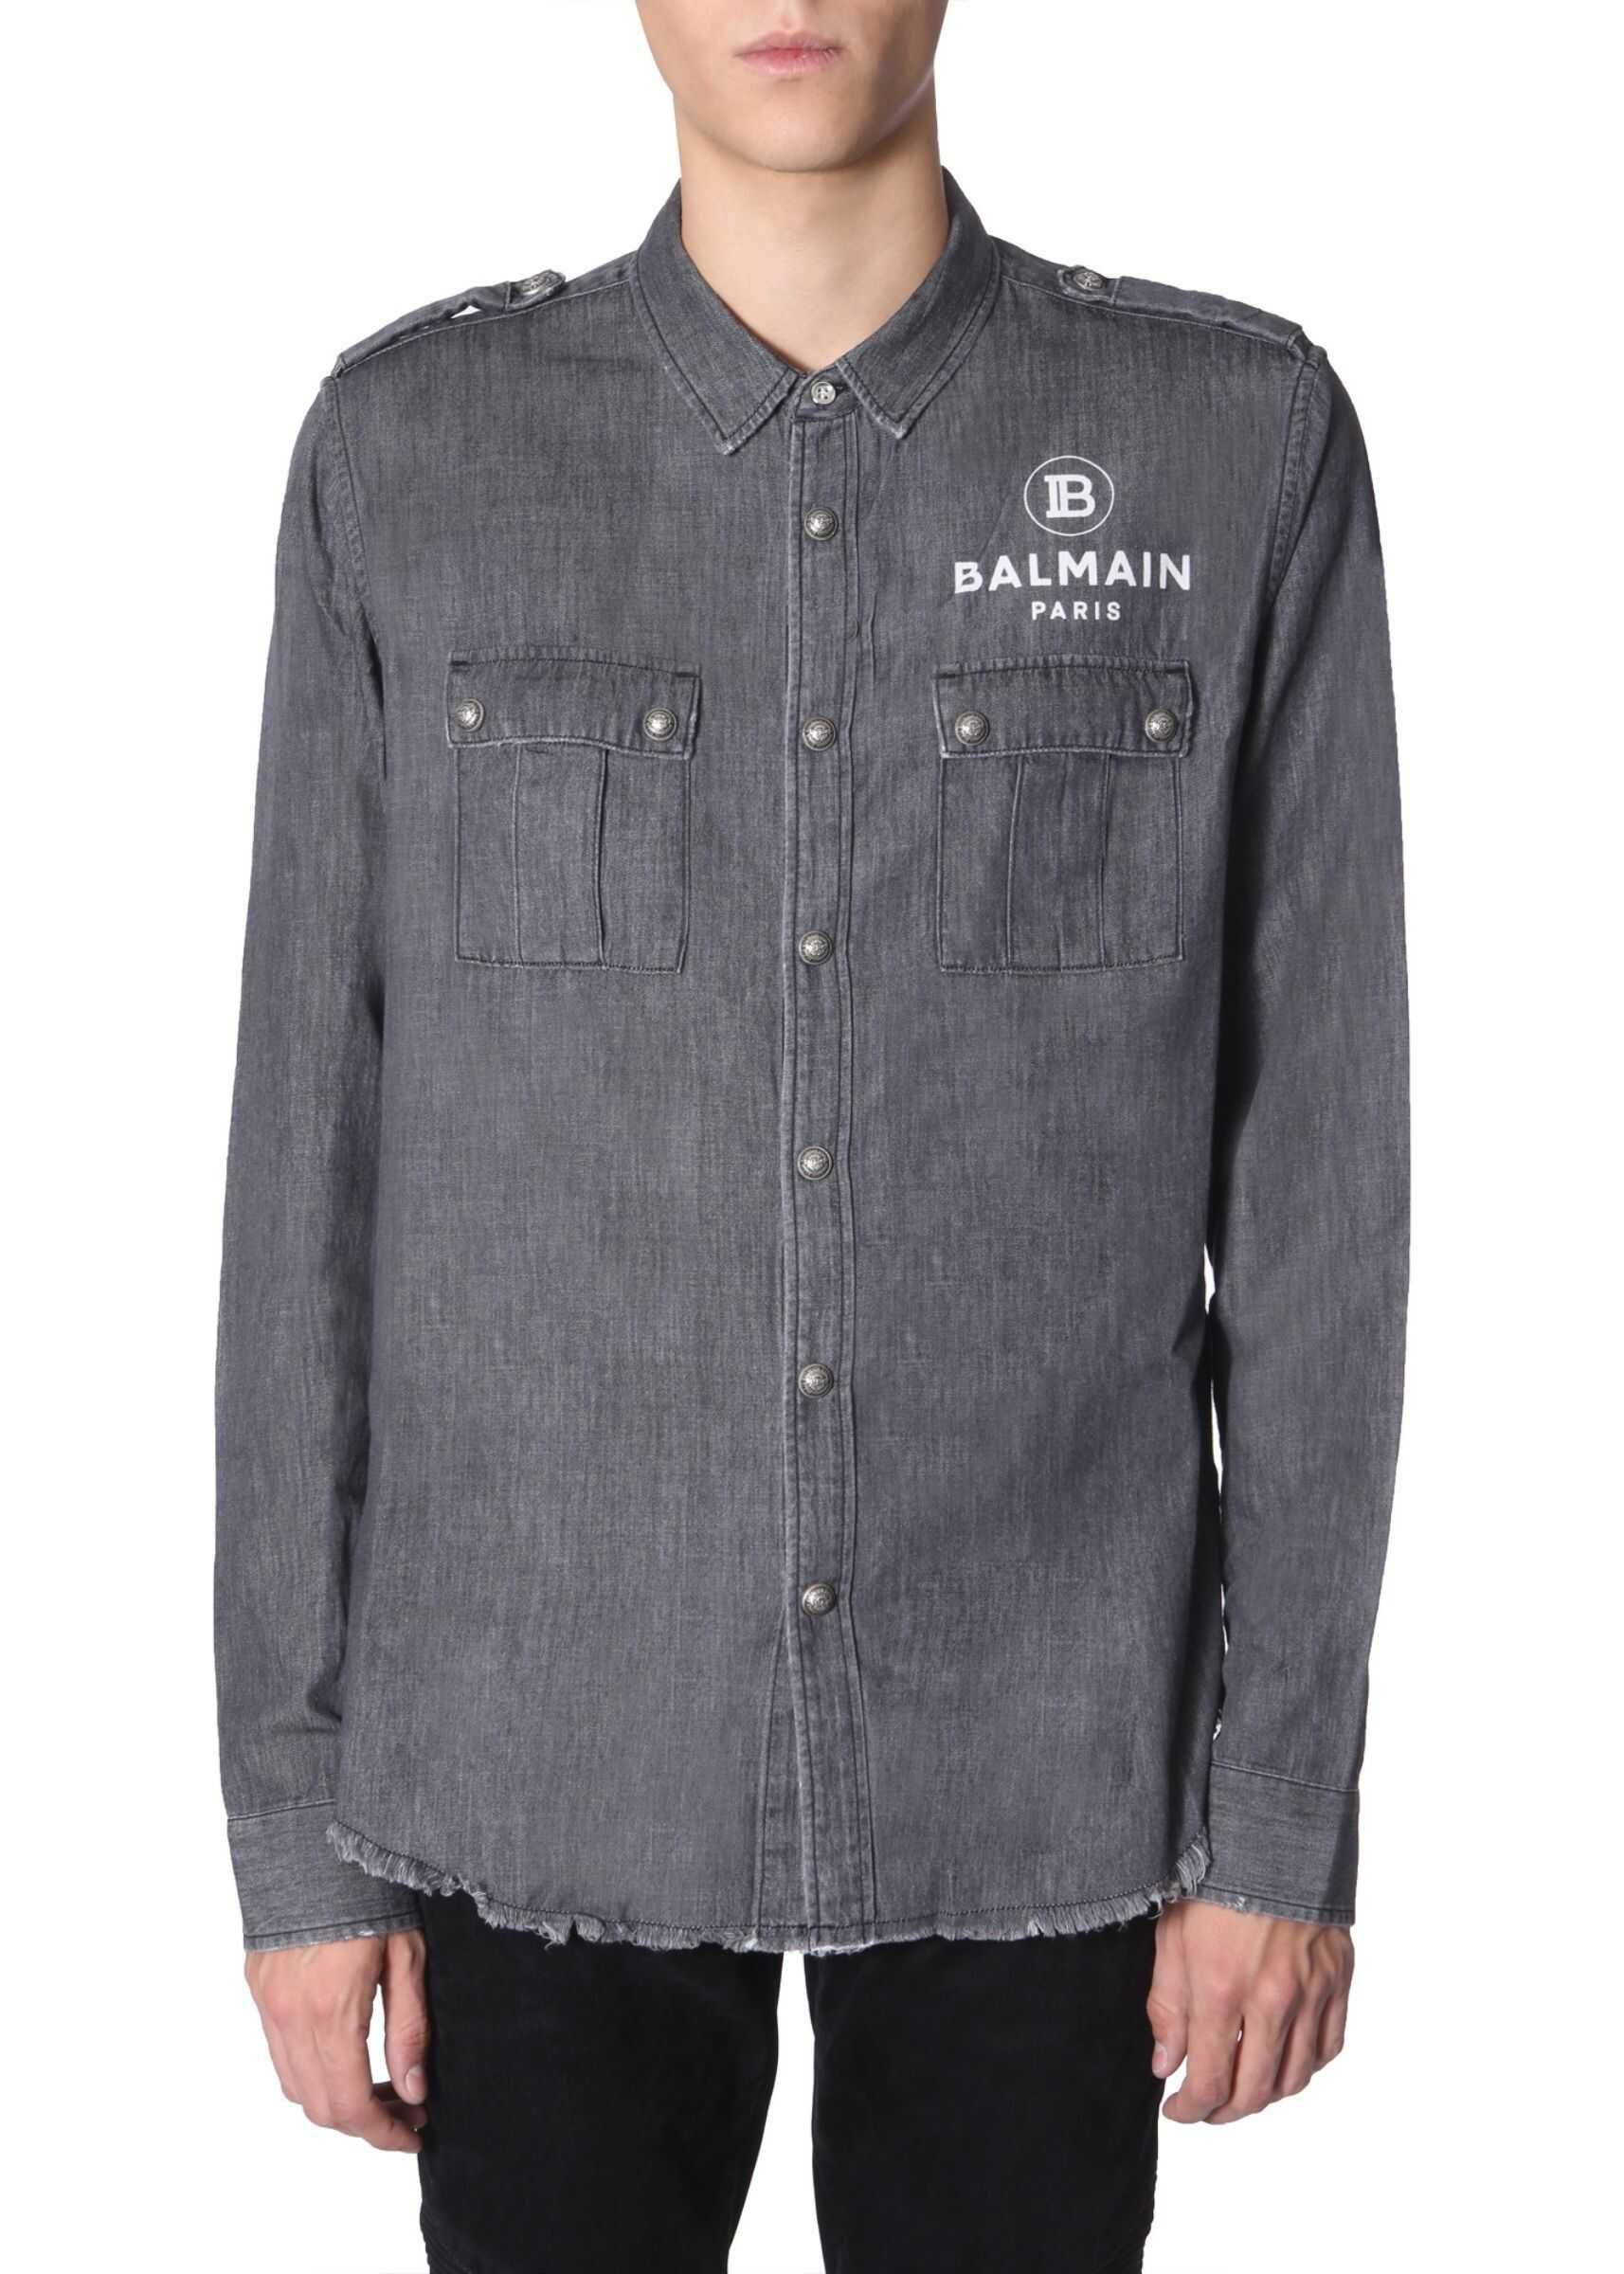 Balmain Denim Shirt GREY